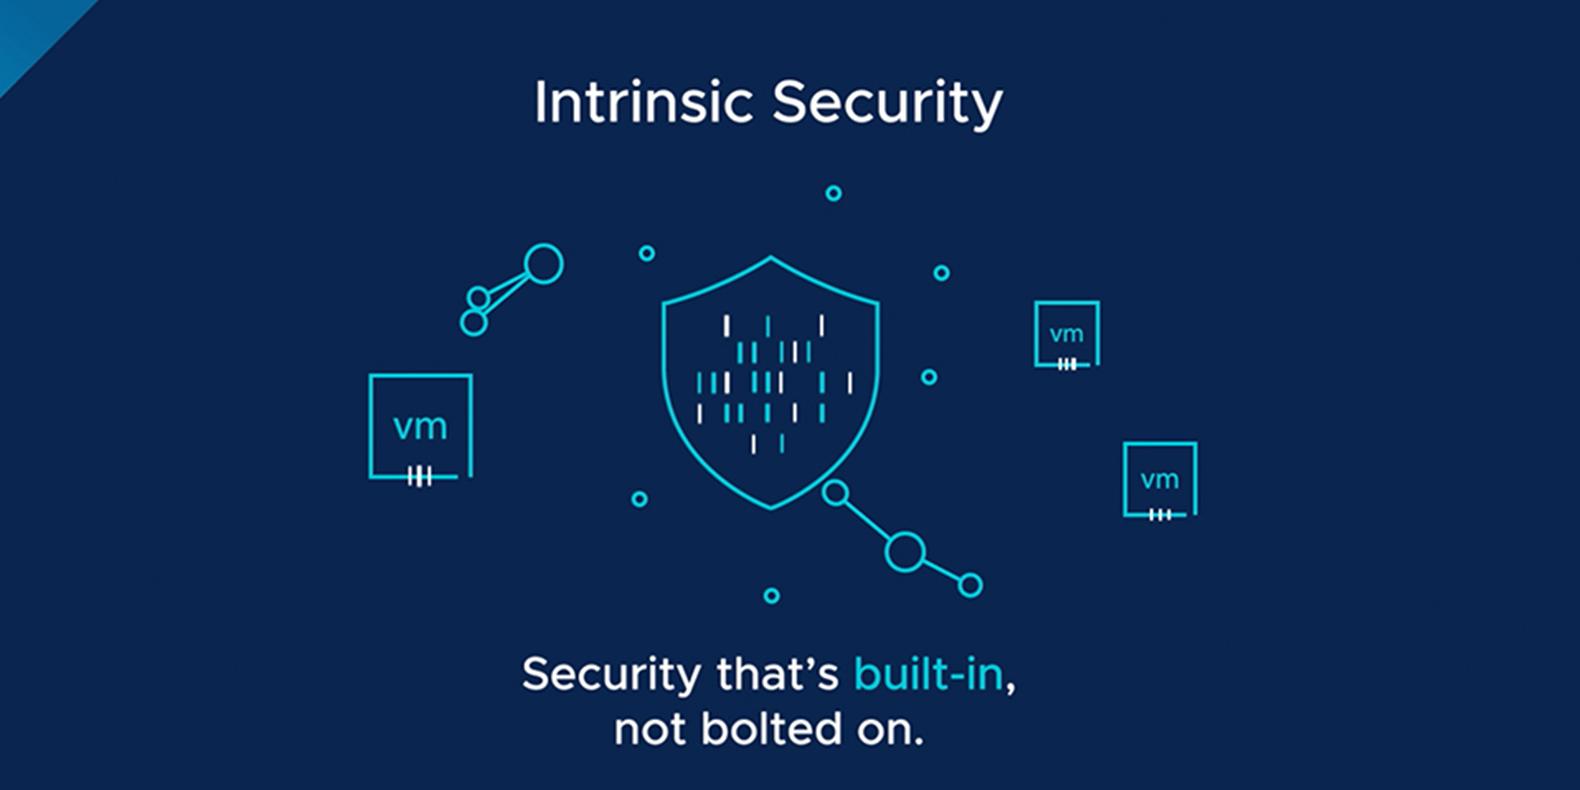 tn-intrinsic-security